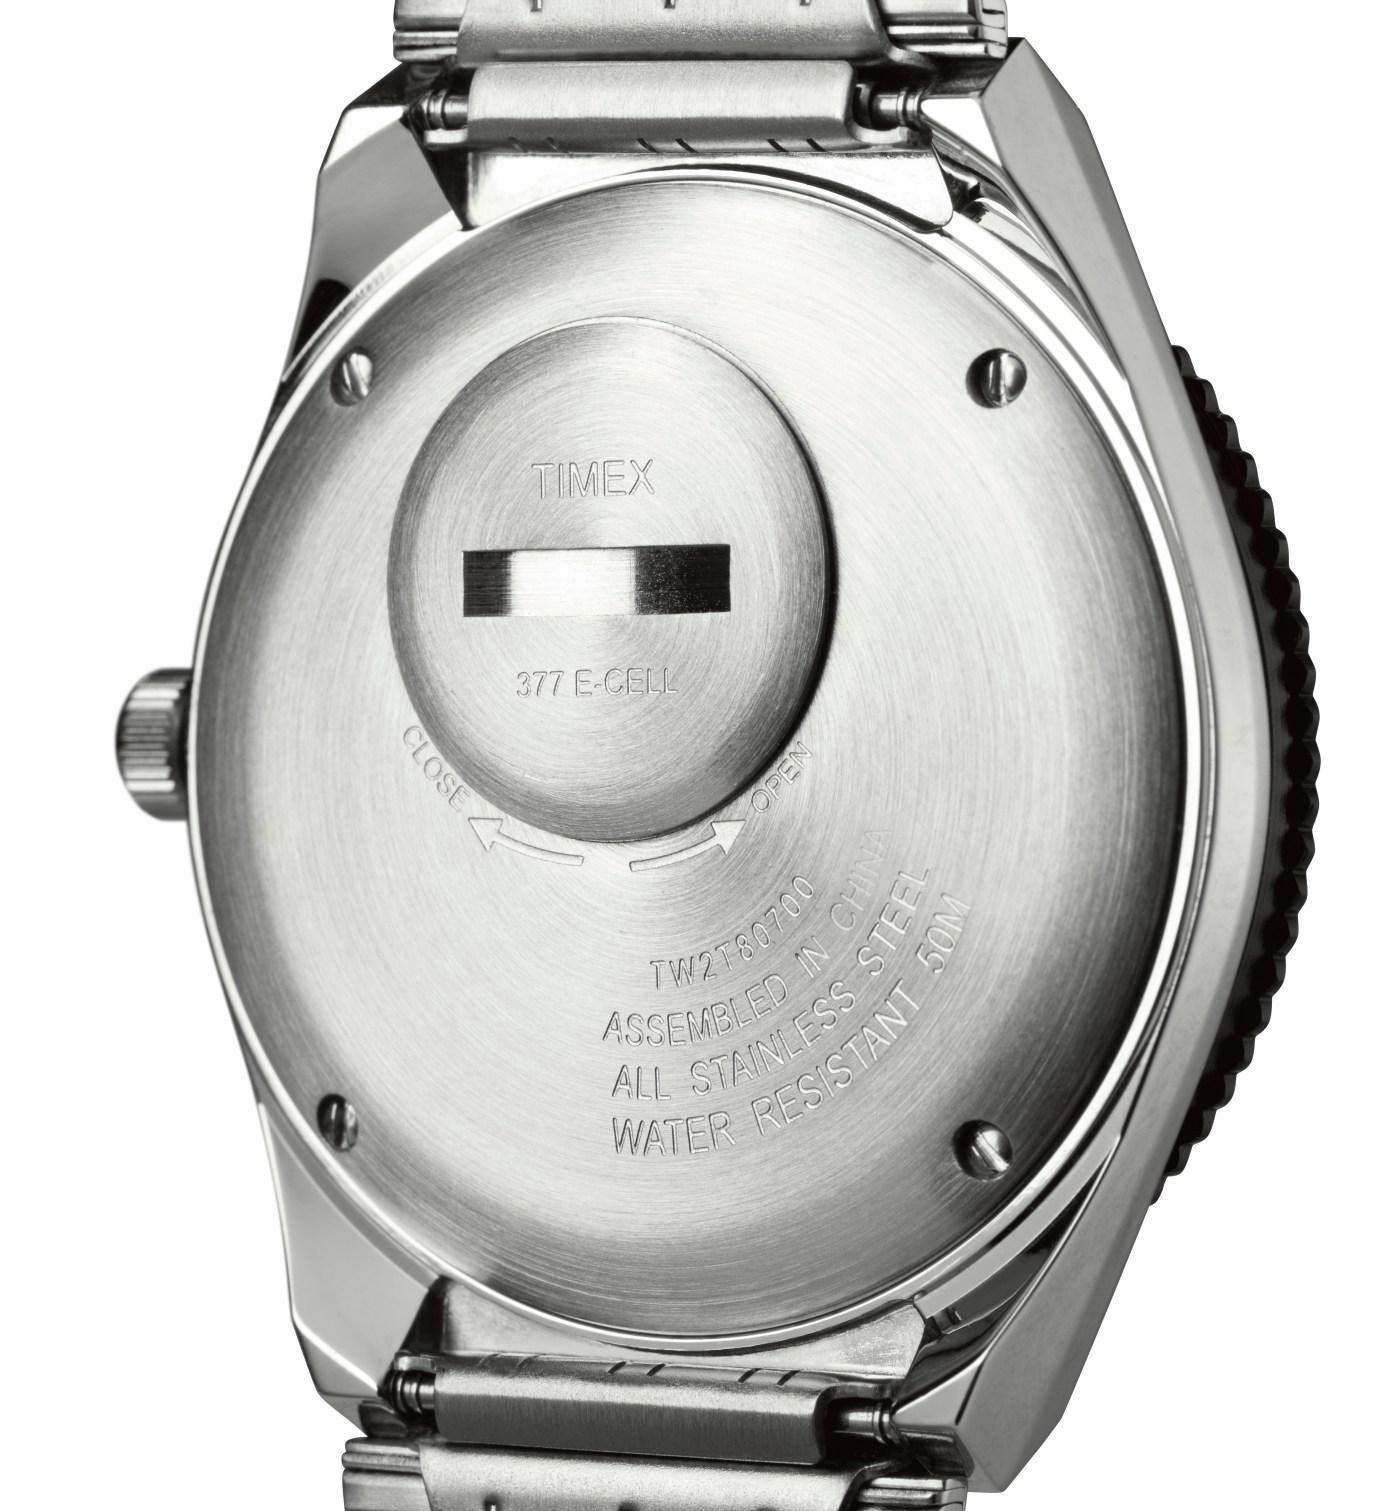 Q-Timex-TW2T80700-Caseback-Battery-Hatch1.jpg